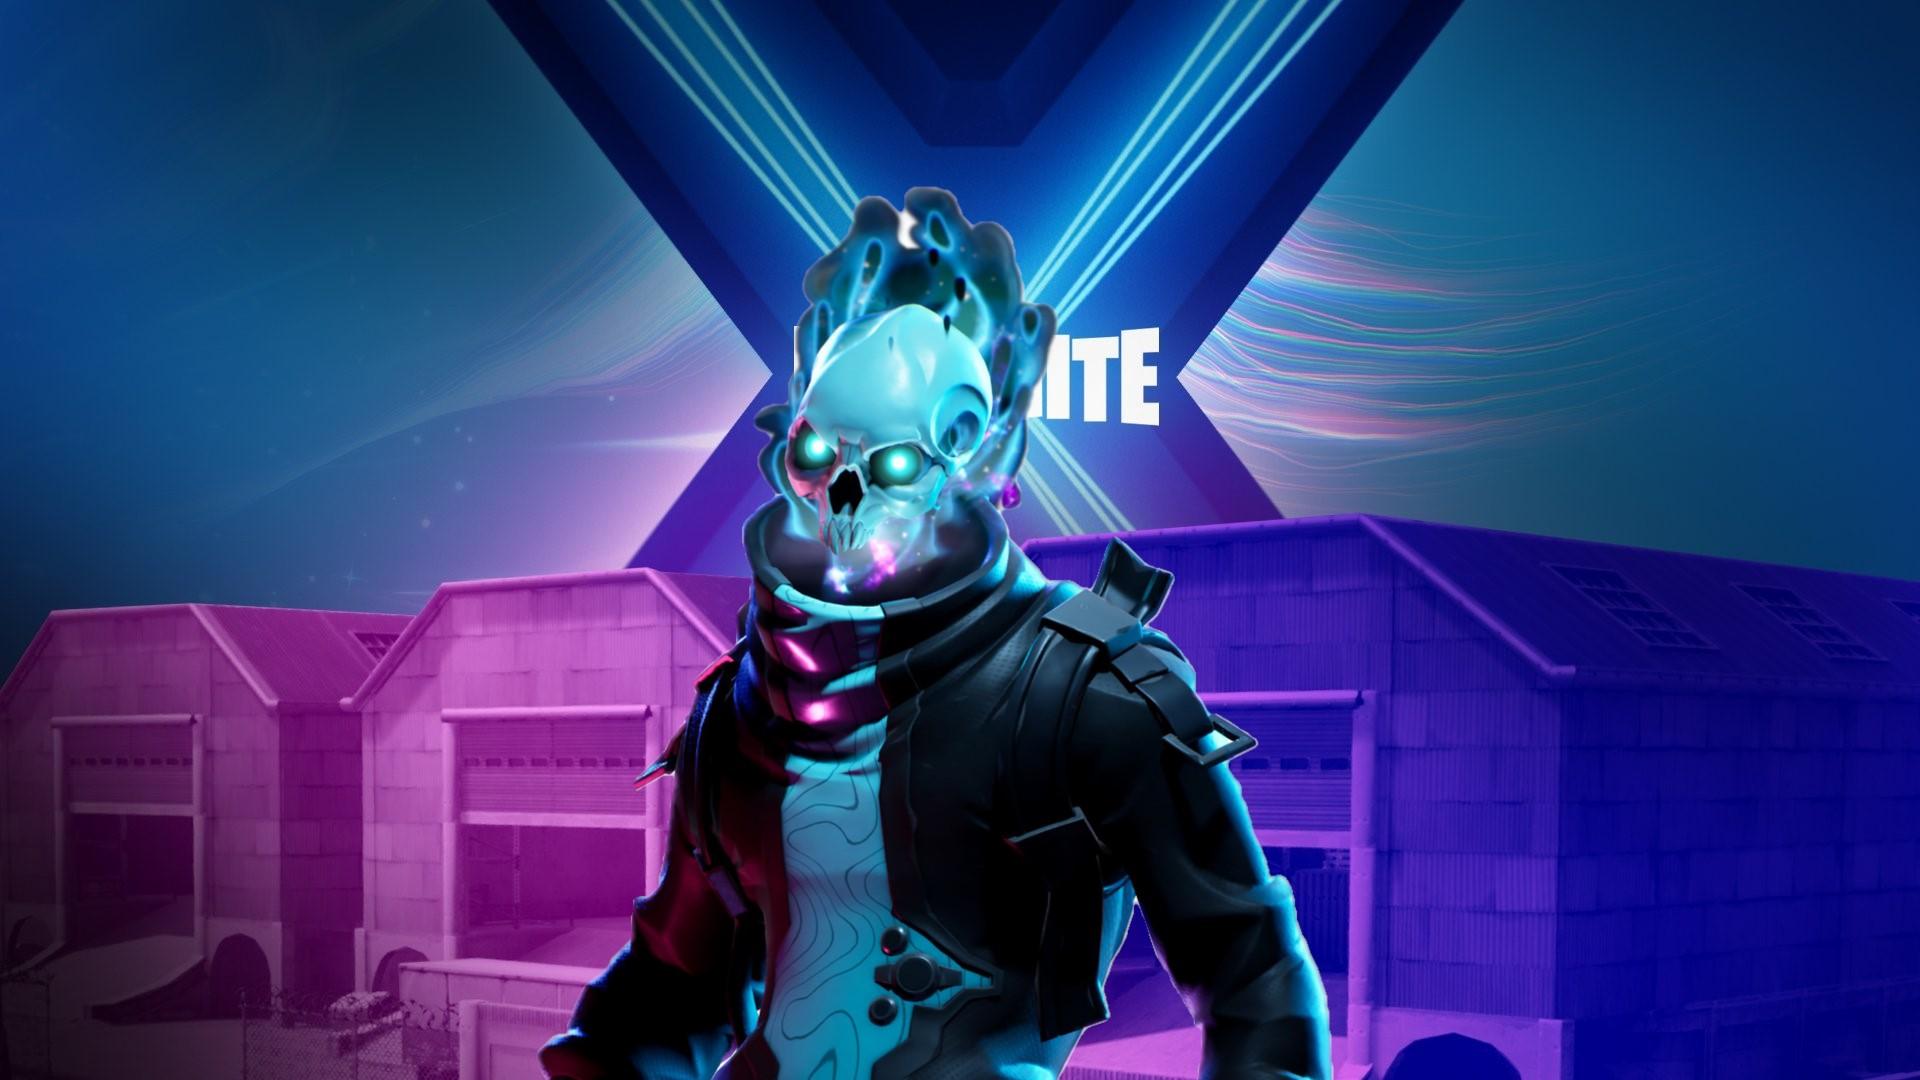 X Lord Fortnite Skin Wallpapers Details Mega Themes